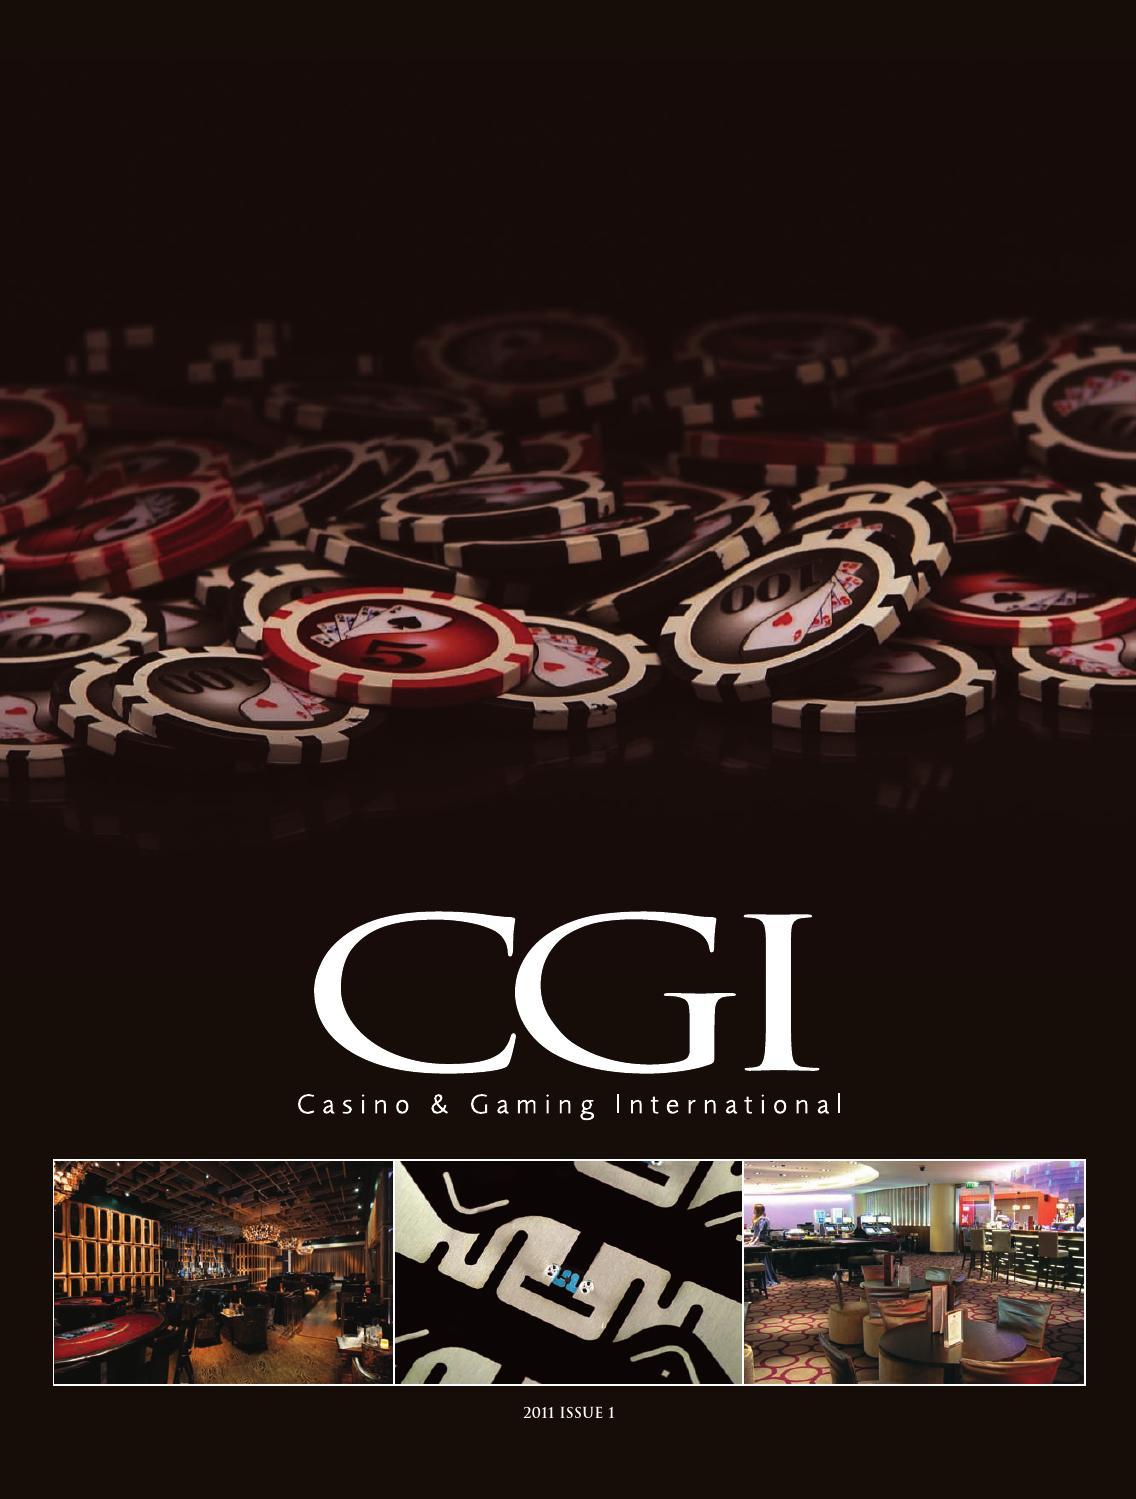 Casino cgi site variable book casino guest mohegan restaurant sun